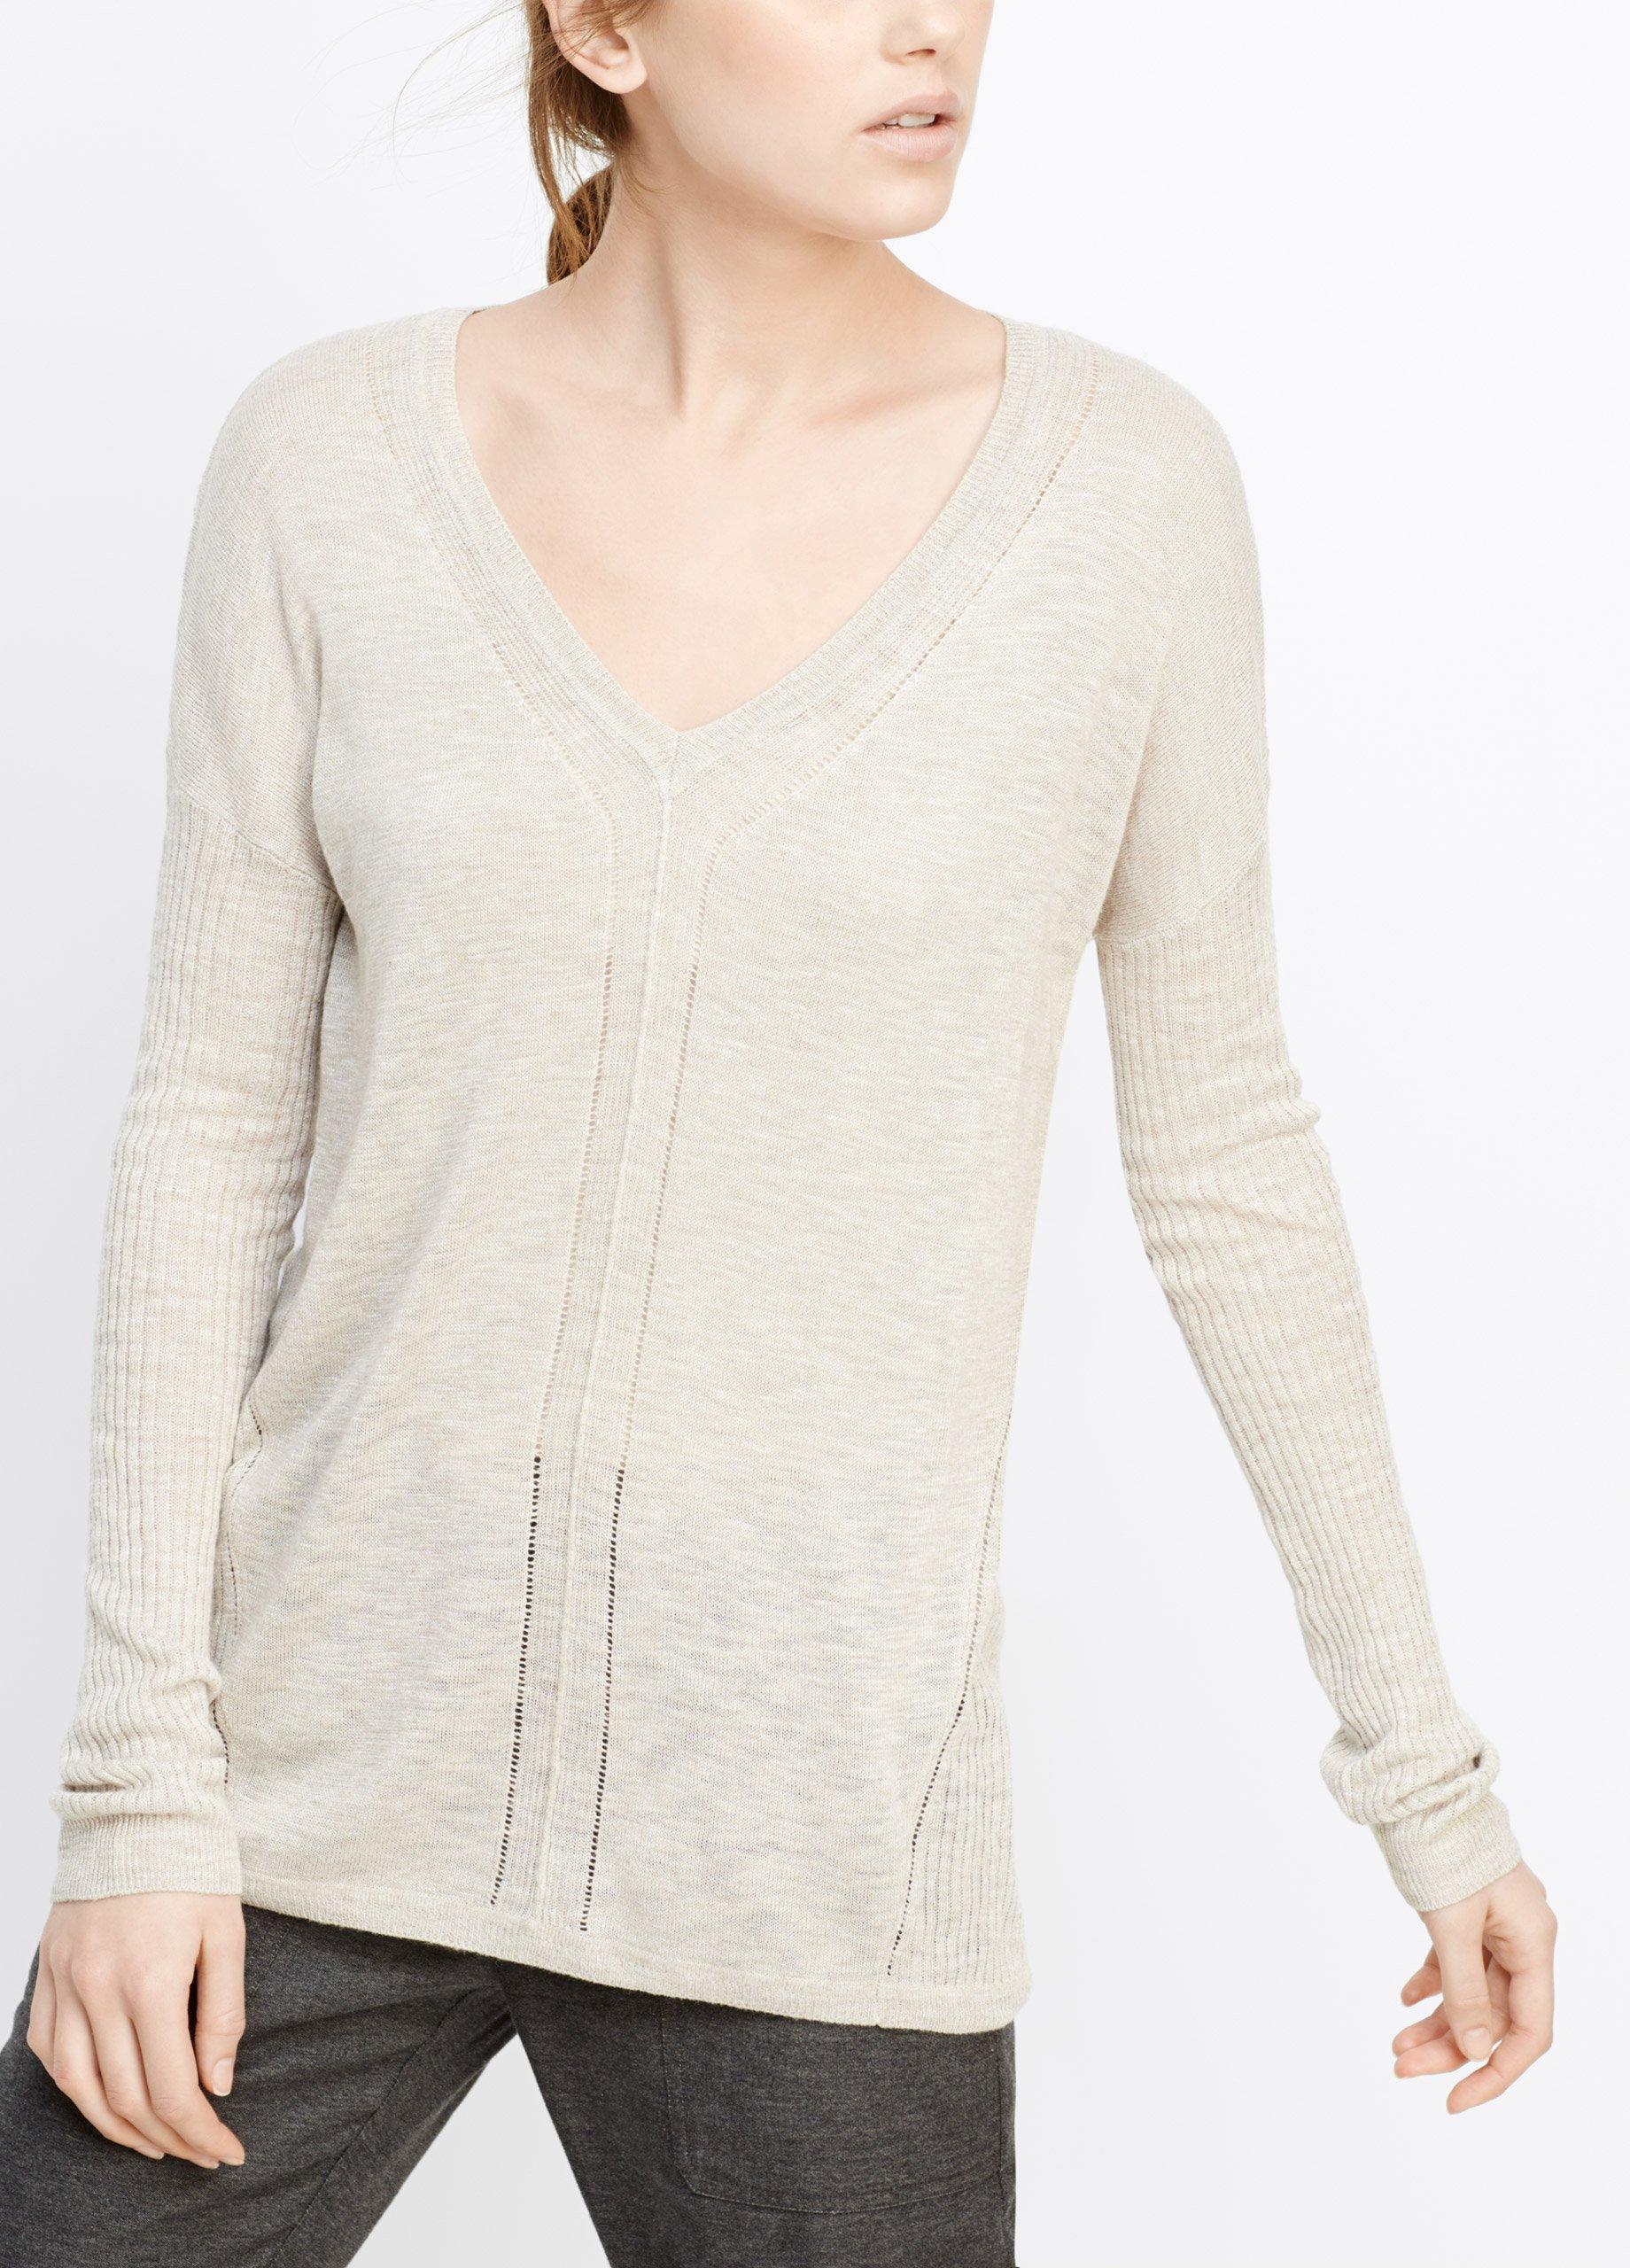 Vince Linen Blend V Neck Sweater With Ladder Stitch Inset